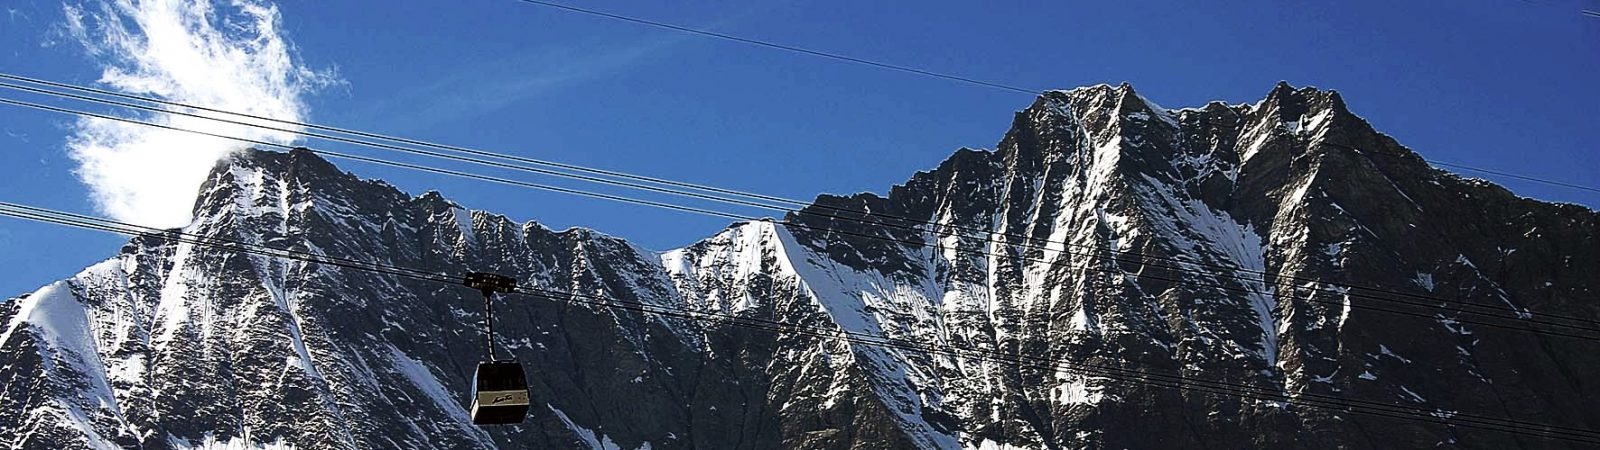 Saas Fee, Alphubel, 2 Day Guided Climb